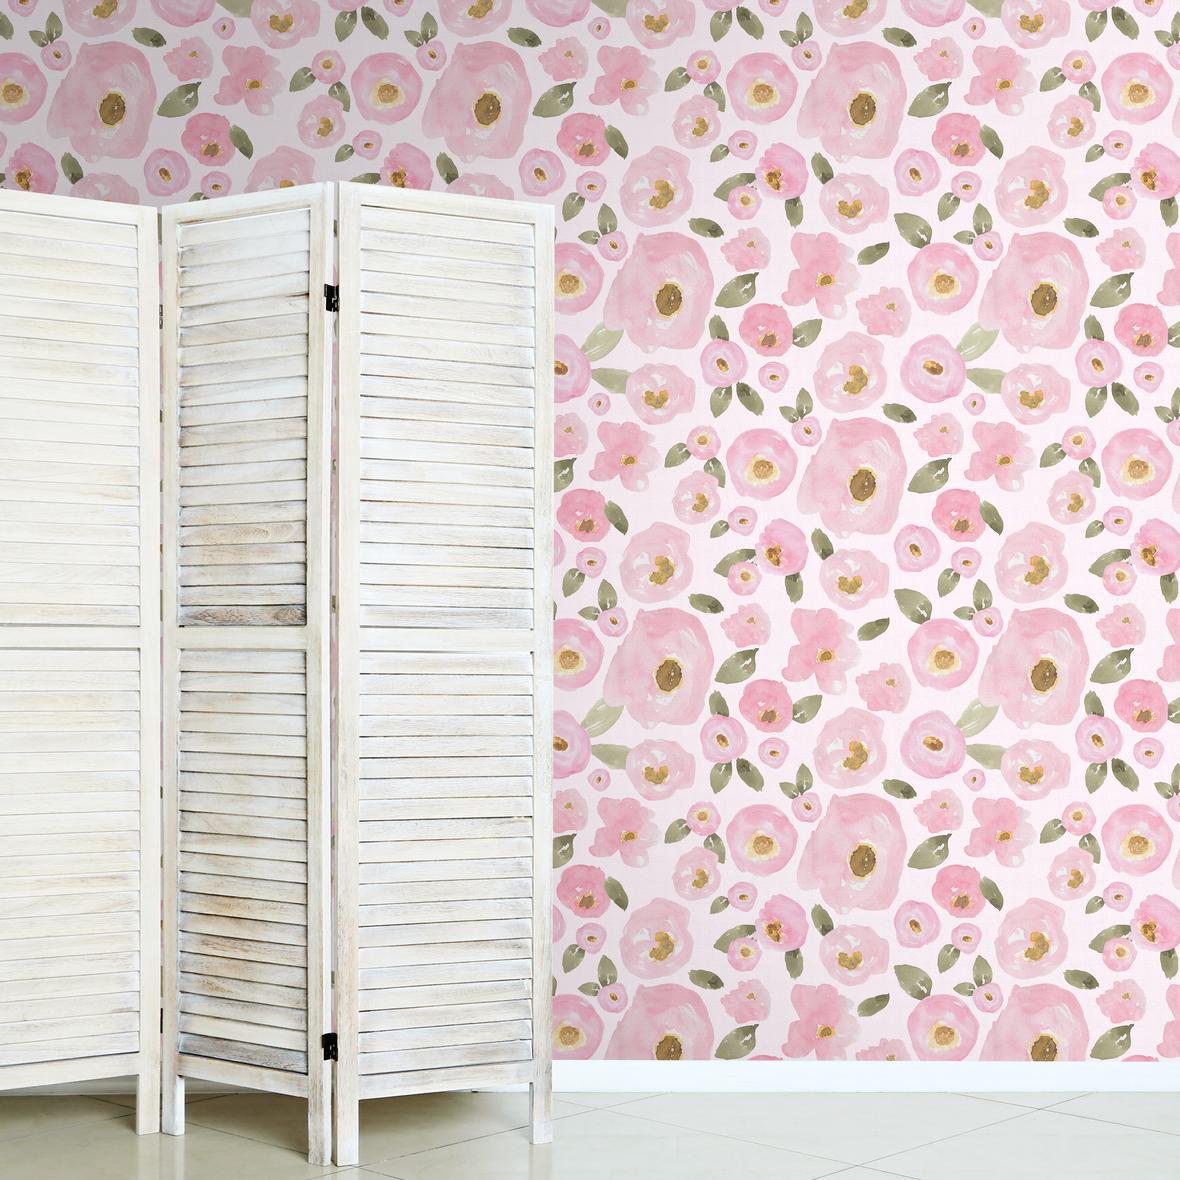 Jovial Blooms in Lotus Pink